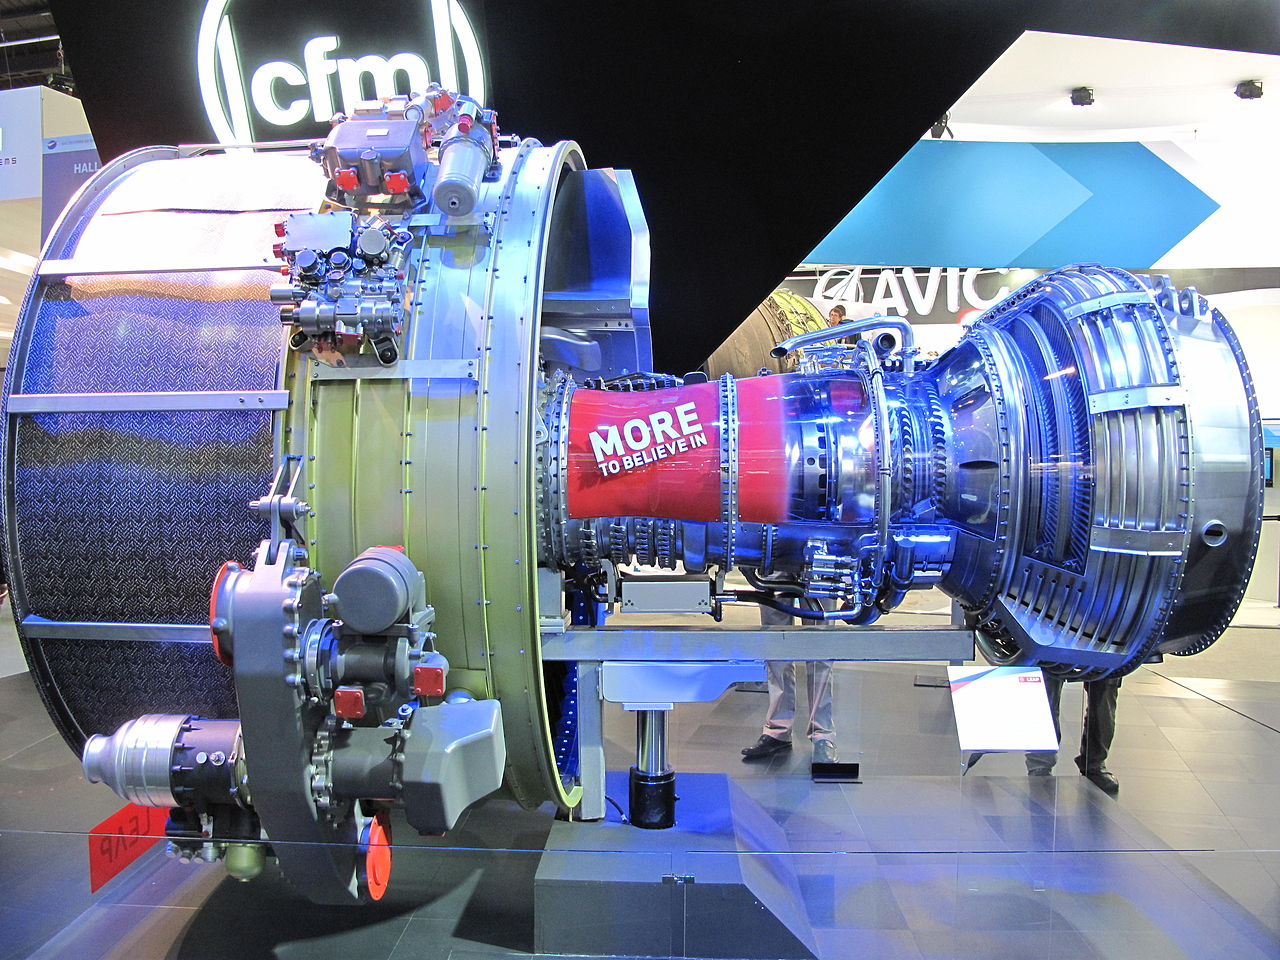 A CFM Turbofan LEAP engine at the 2013 Paris Air Show.